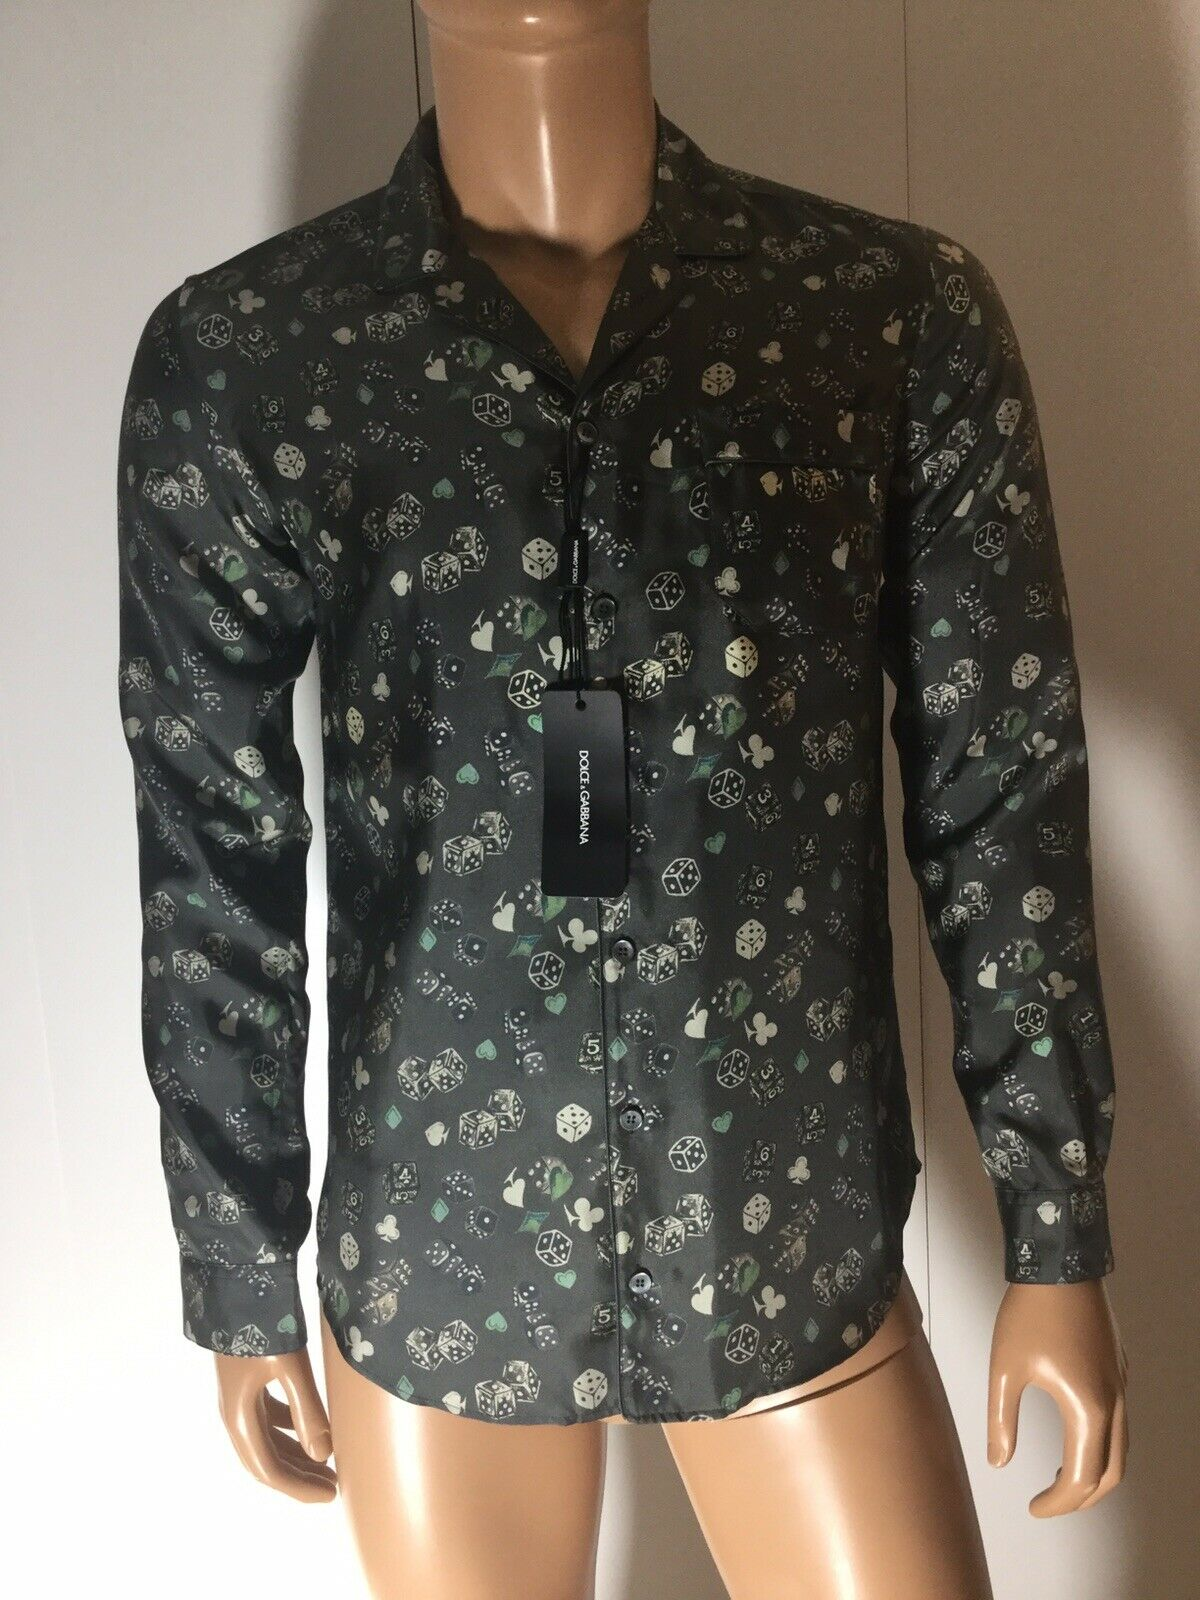 NWT $640 DOLCE /& GABBANA Purple Hedgehog SILK Pajama Shirt Sleepwear IT4// US S